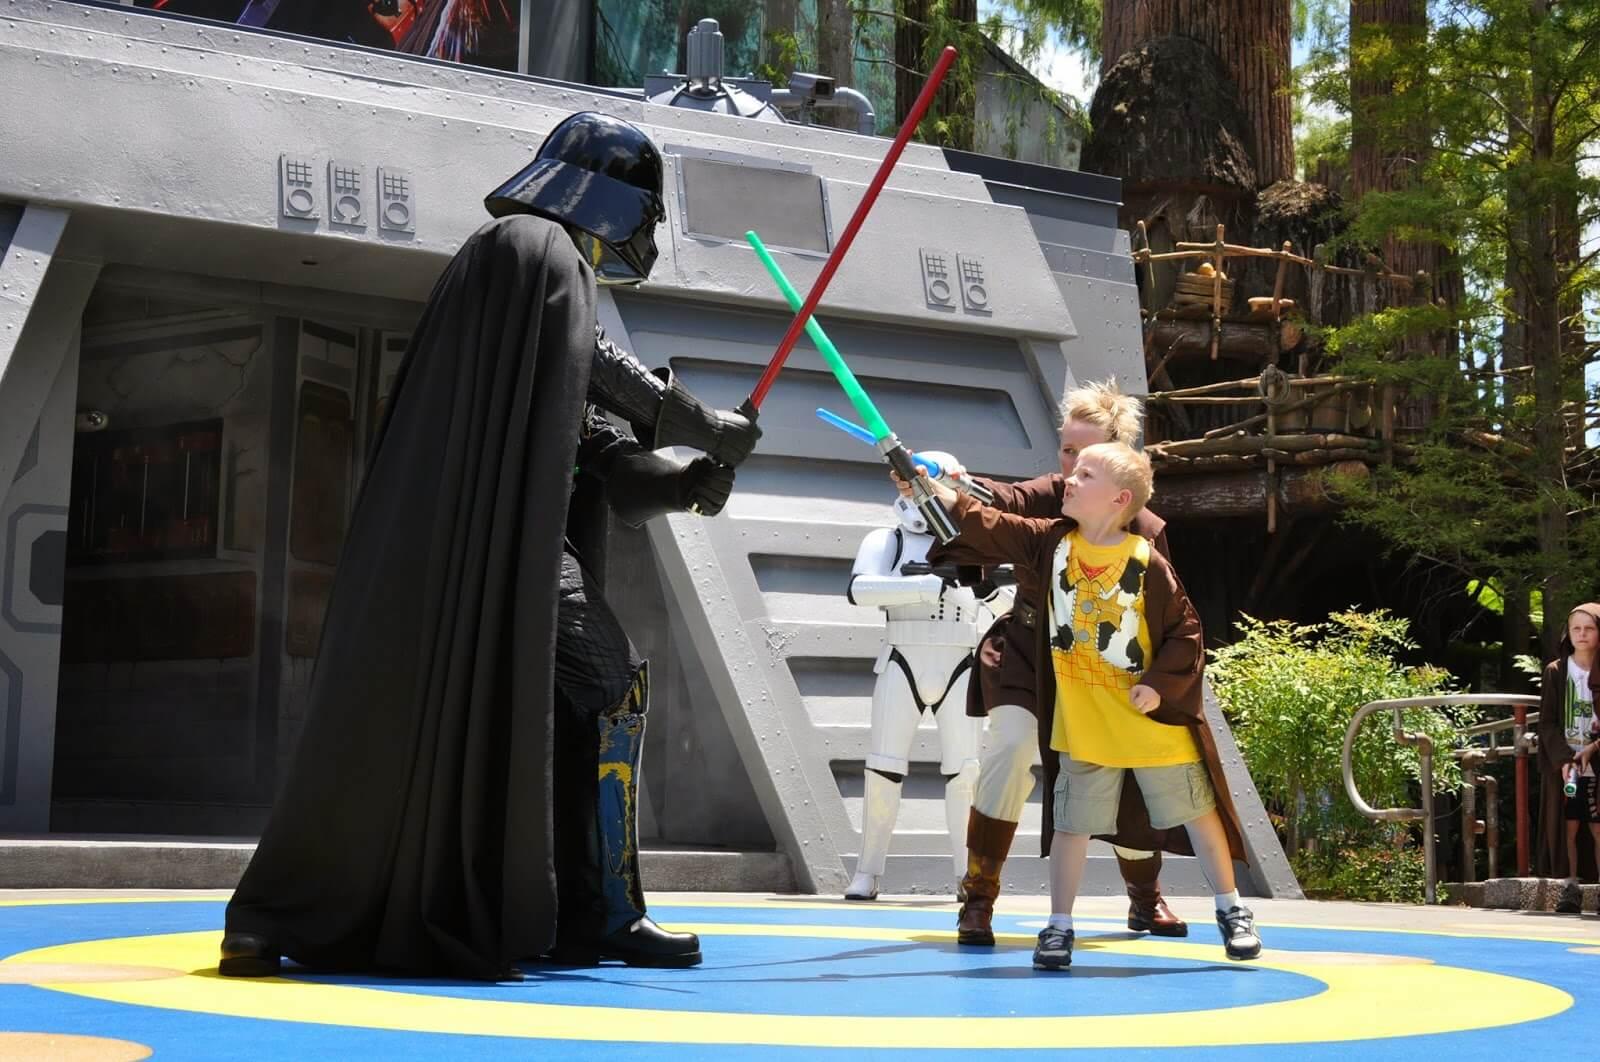 Star Wars Jedi Academy allows kids 4-12 to dual Darth Vadar himself